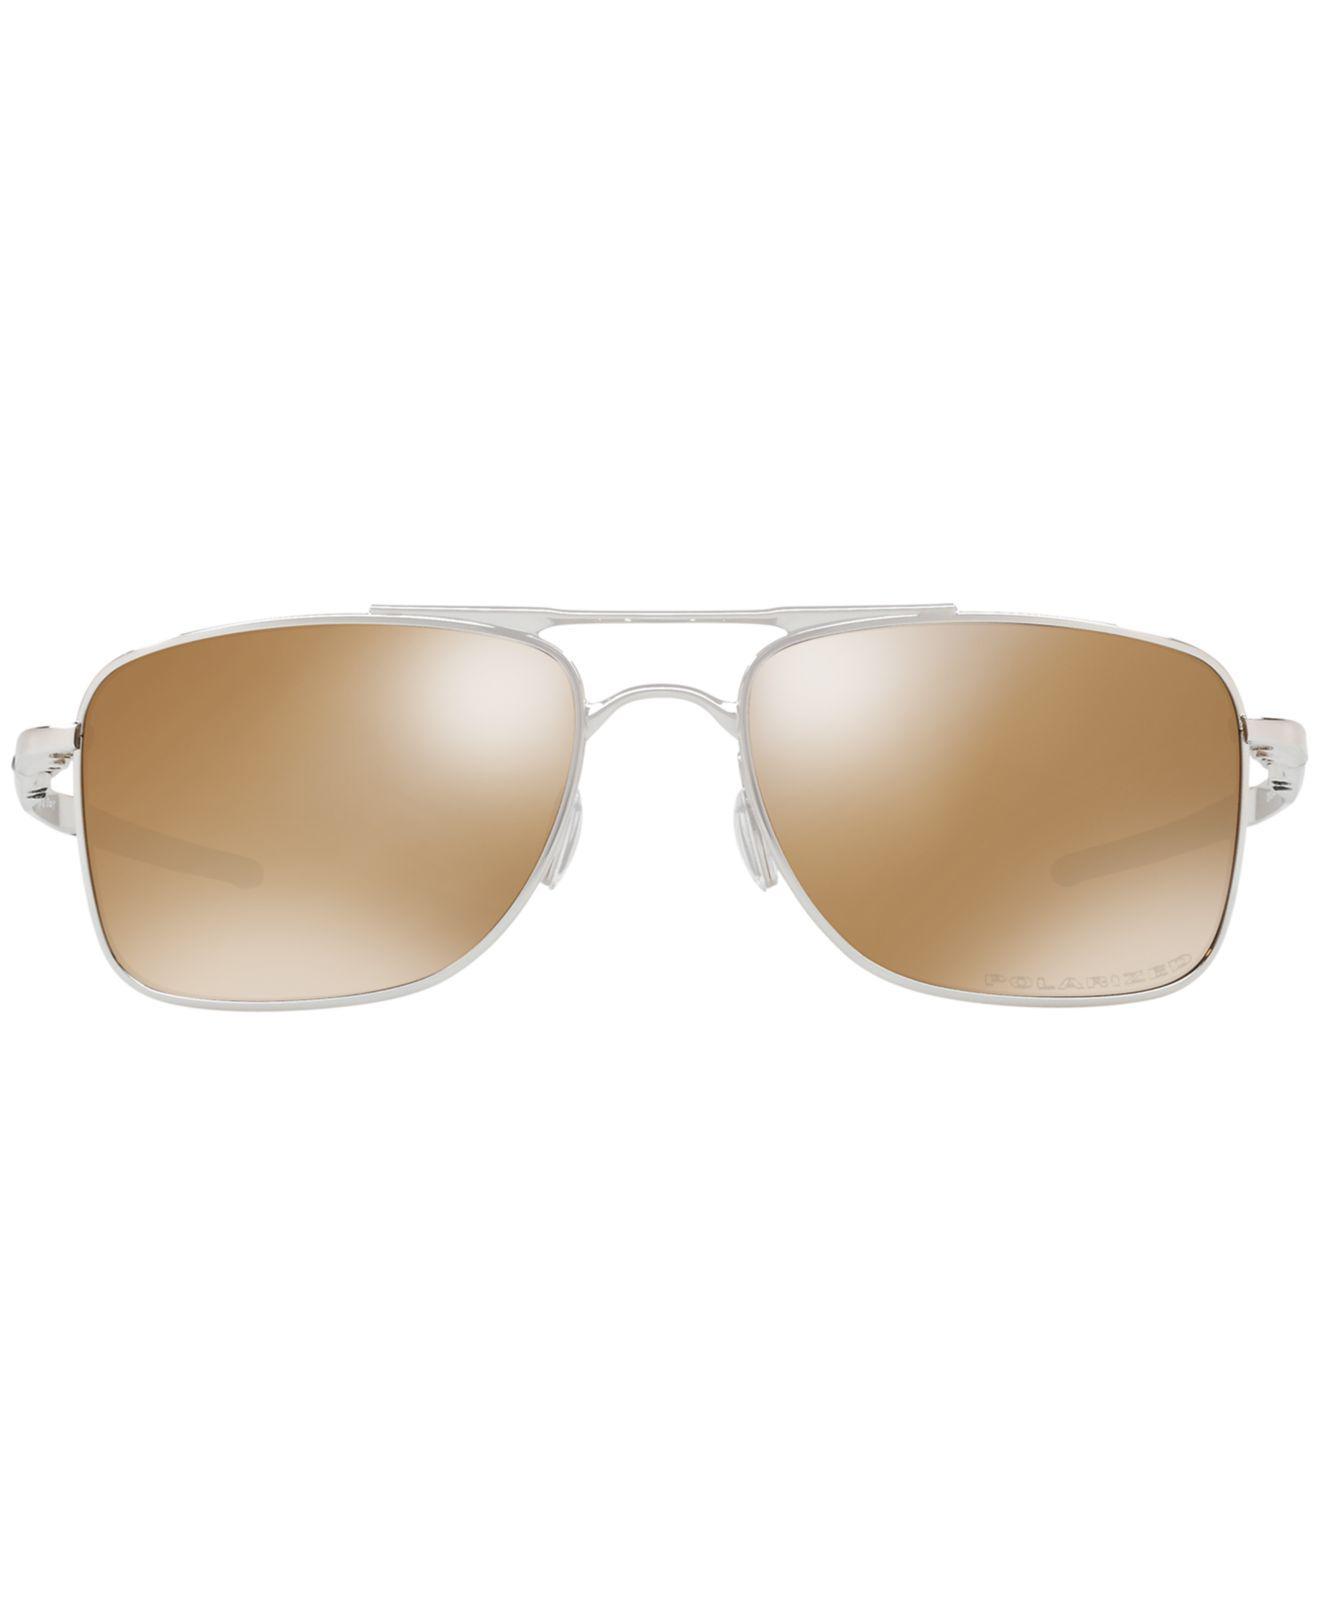 686118ae9d Lyst - Oakley Gauge 8 Sunglasses